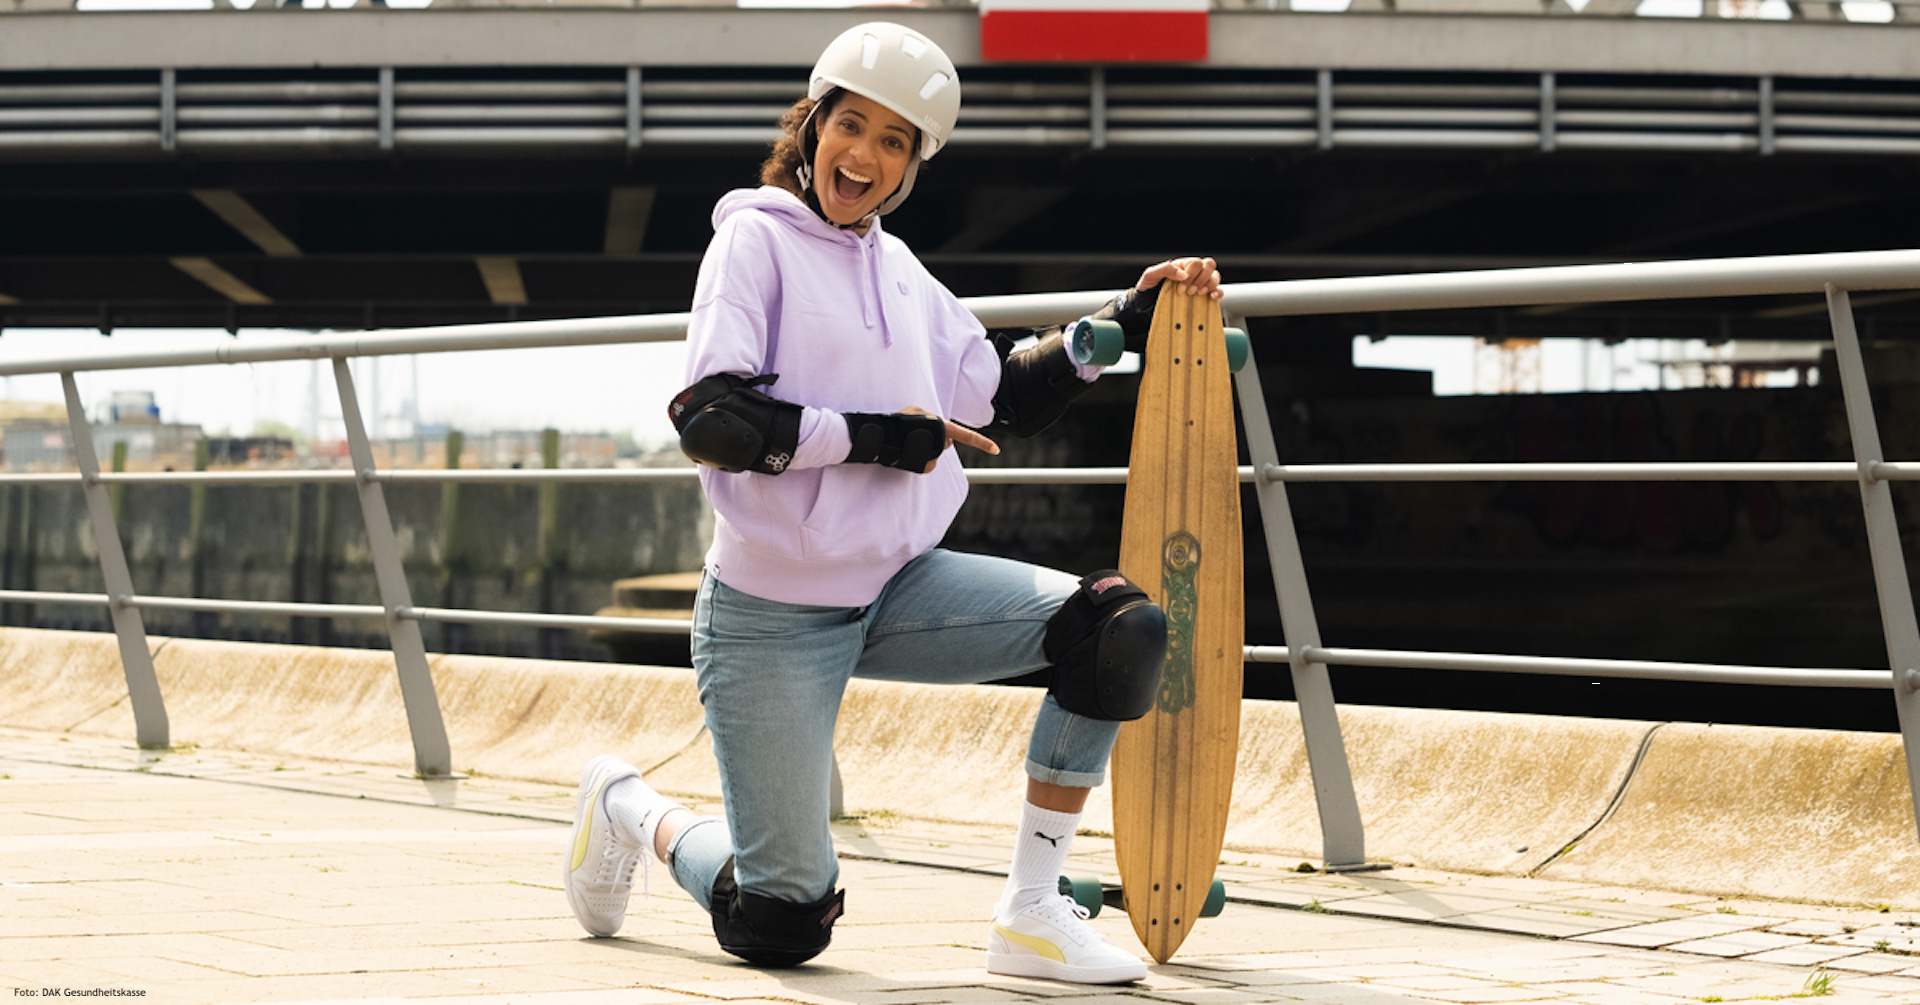 DAK #fitwoch Botschafterin Marie-Laurence Jungfleisch beim Longboarden